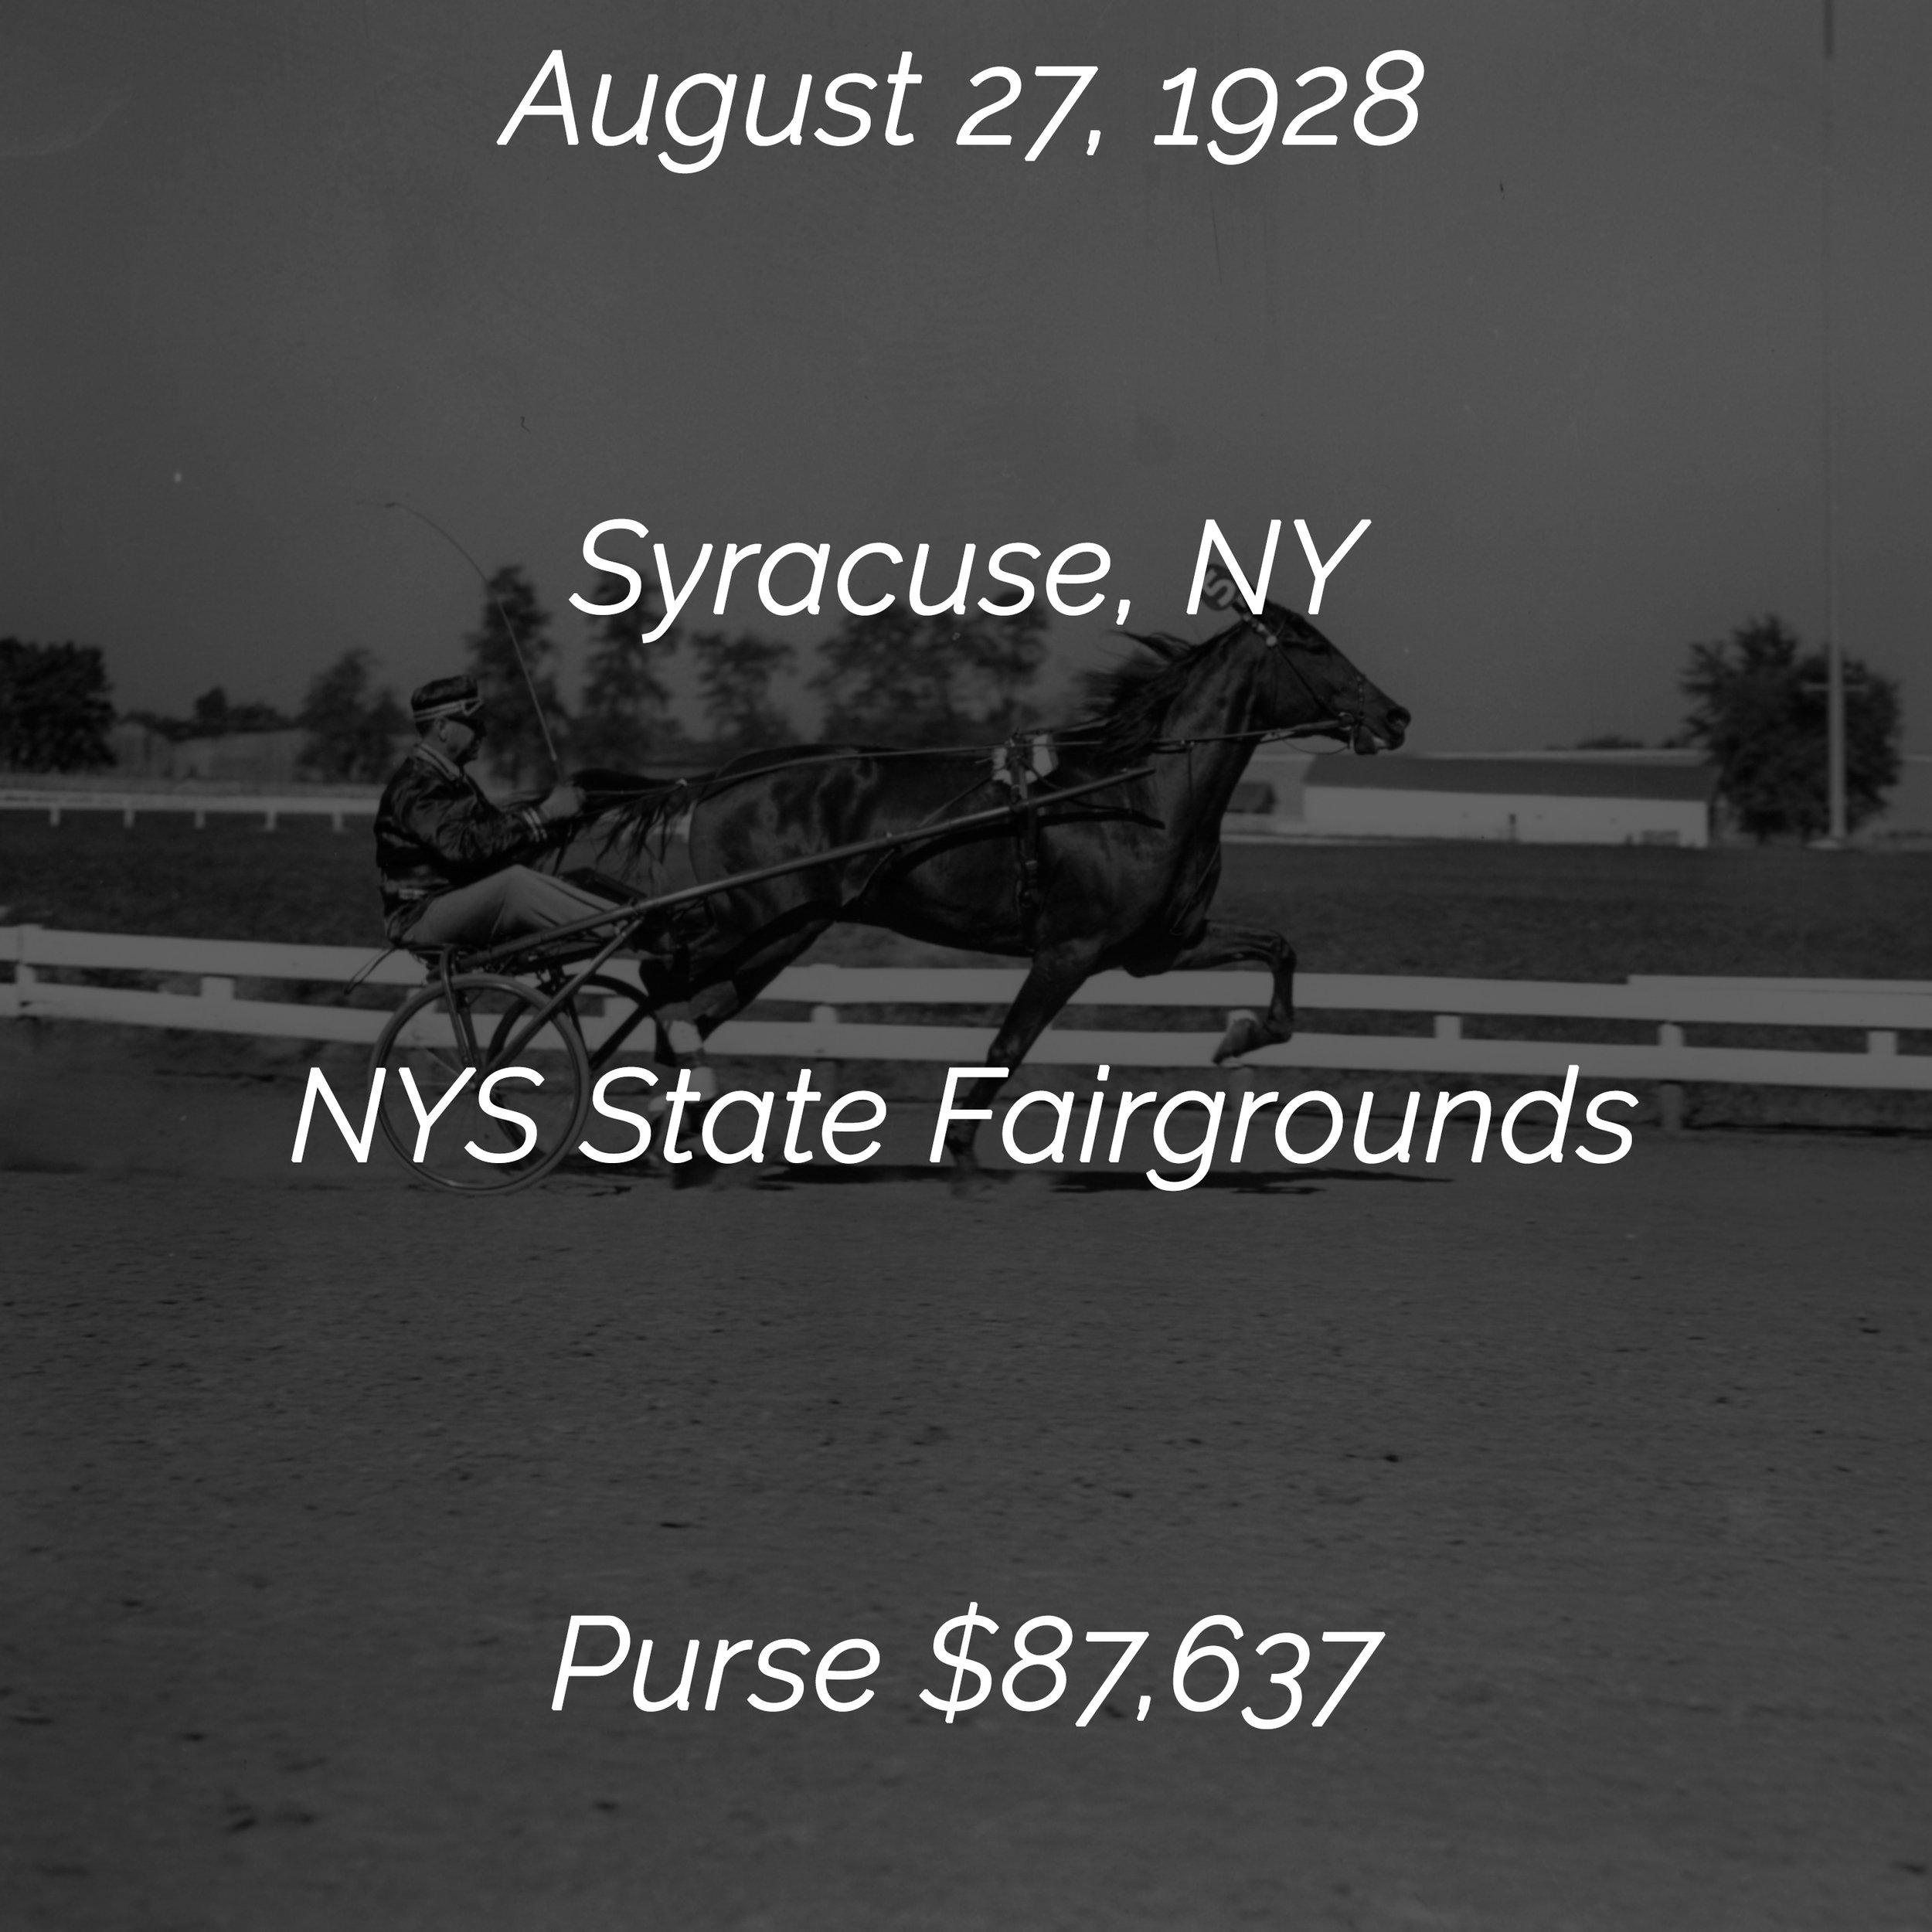 1928 history info square.jpg